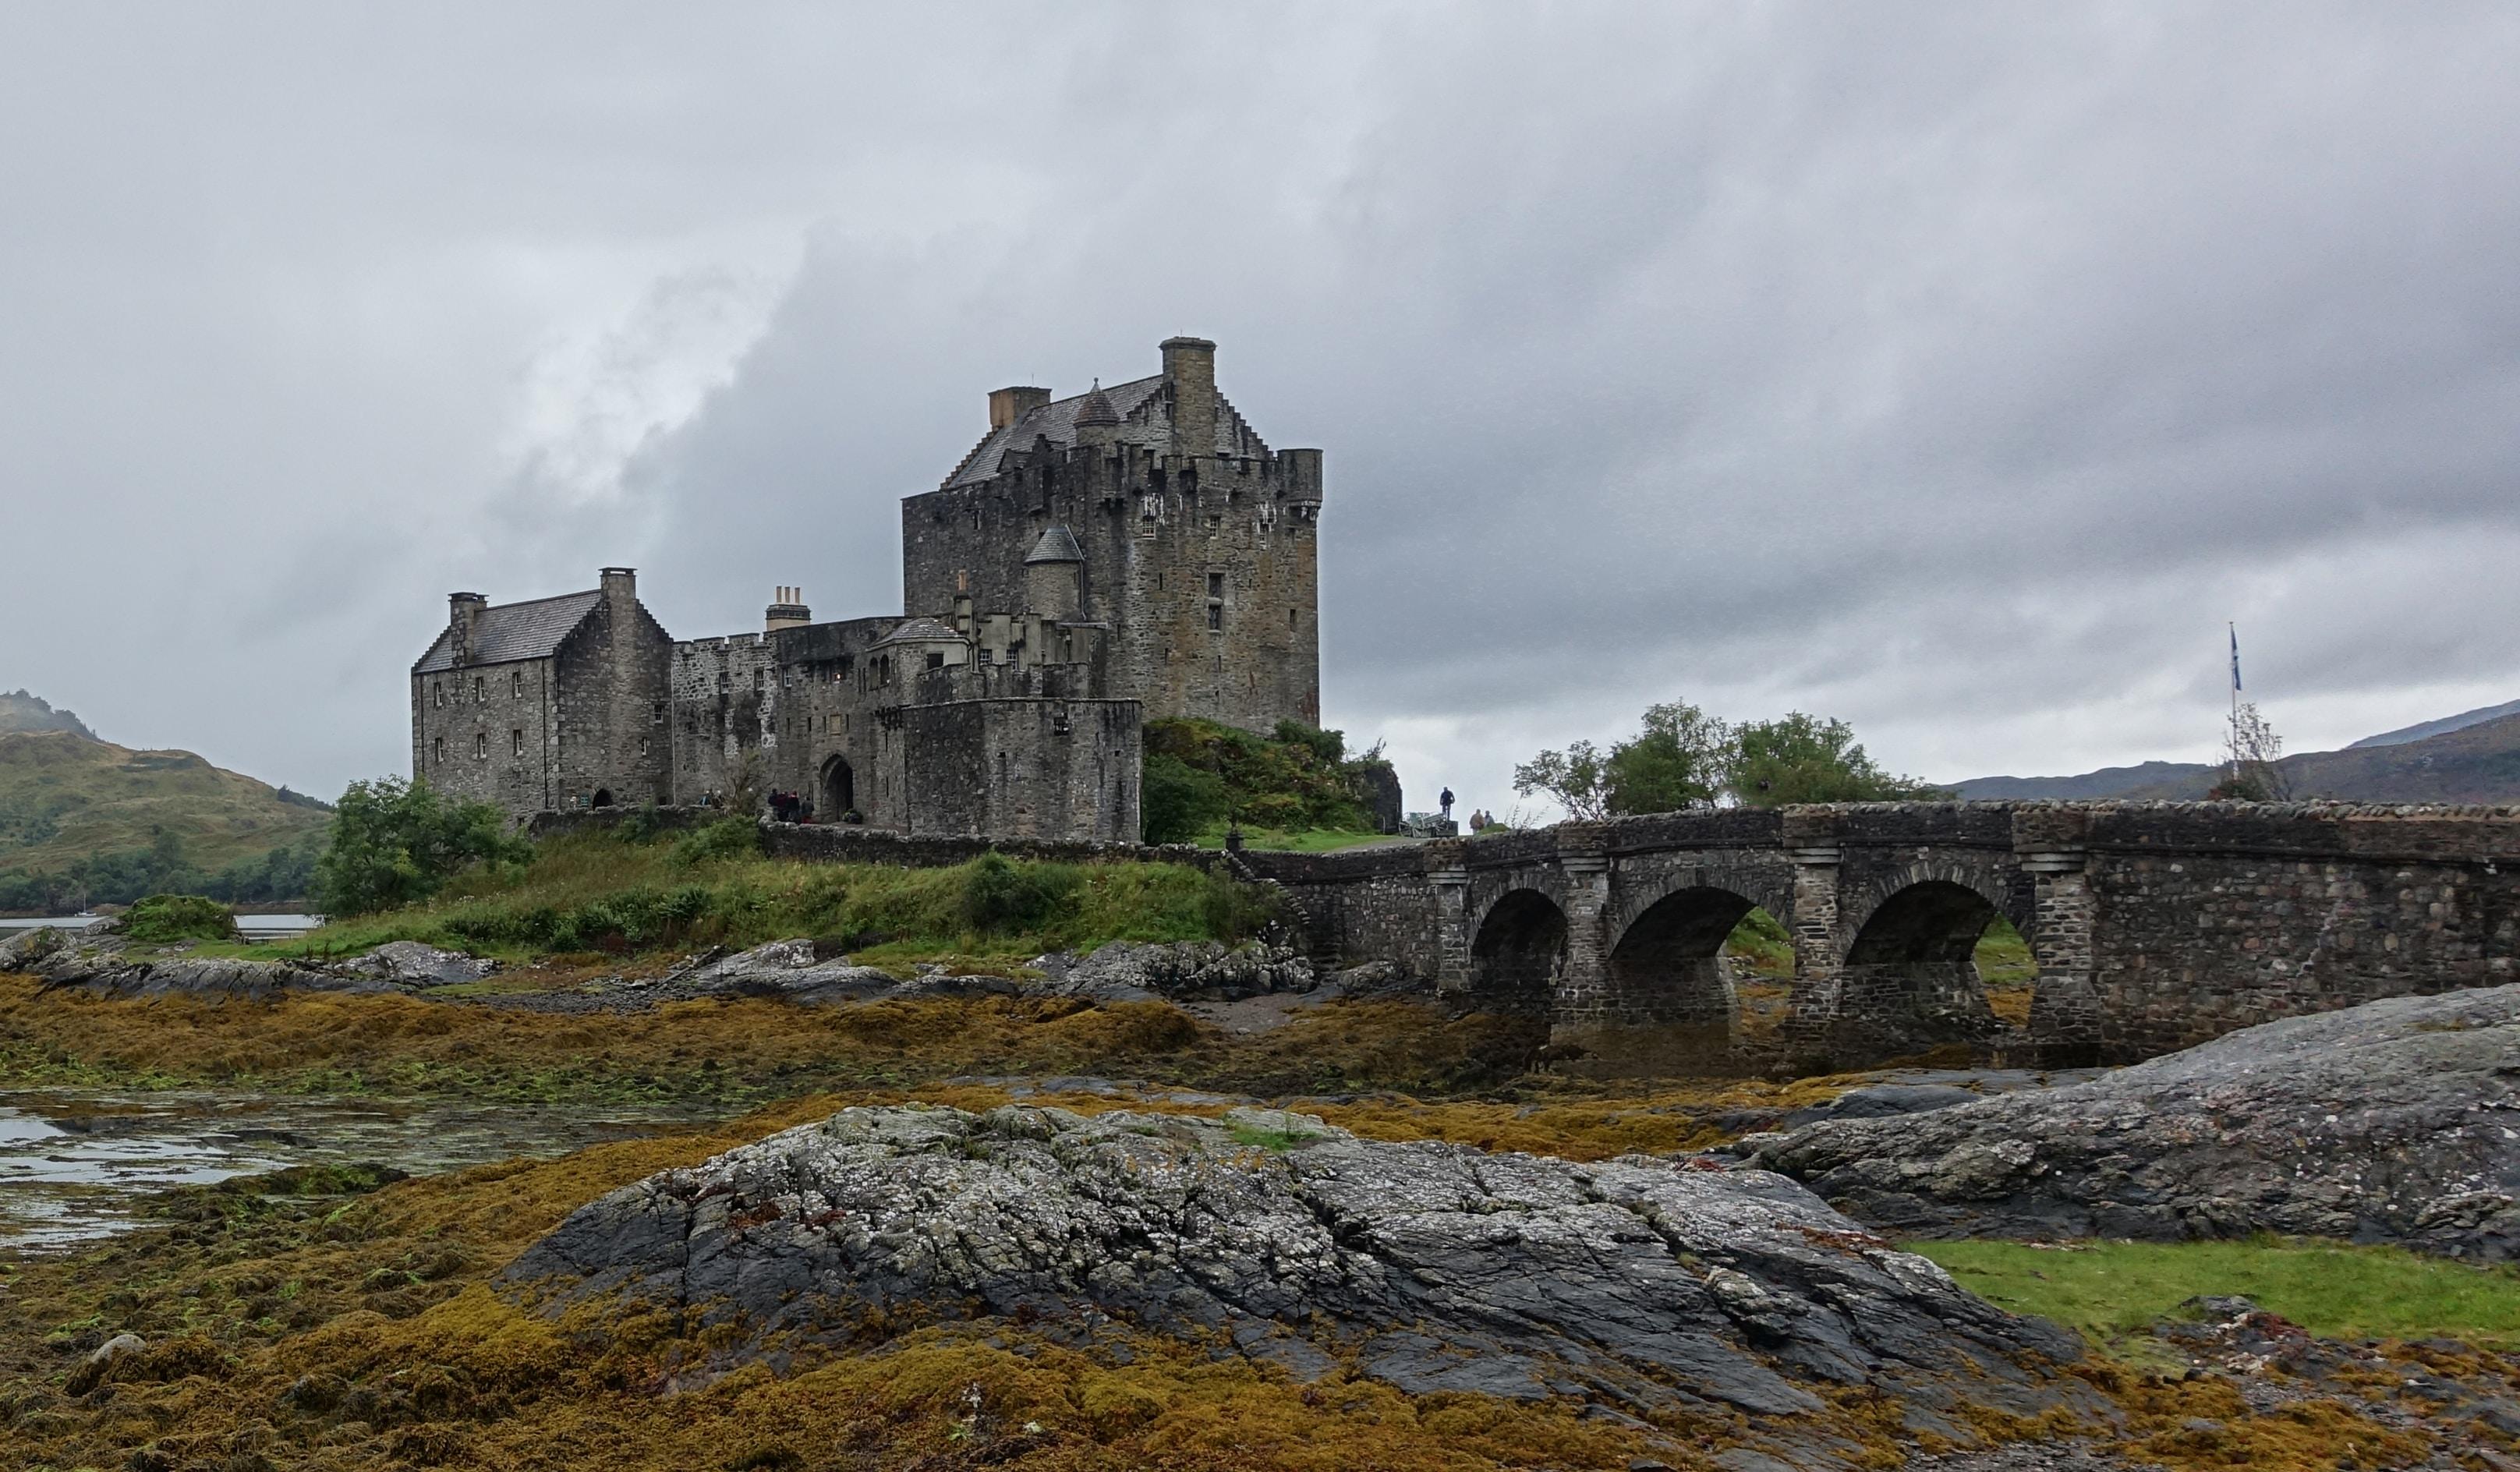 Haunted castle stories